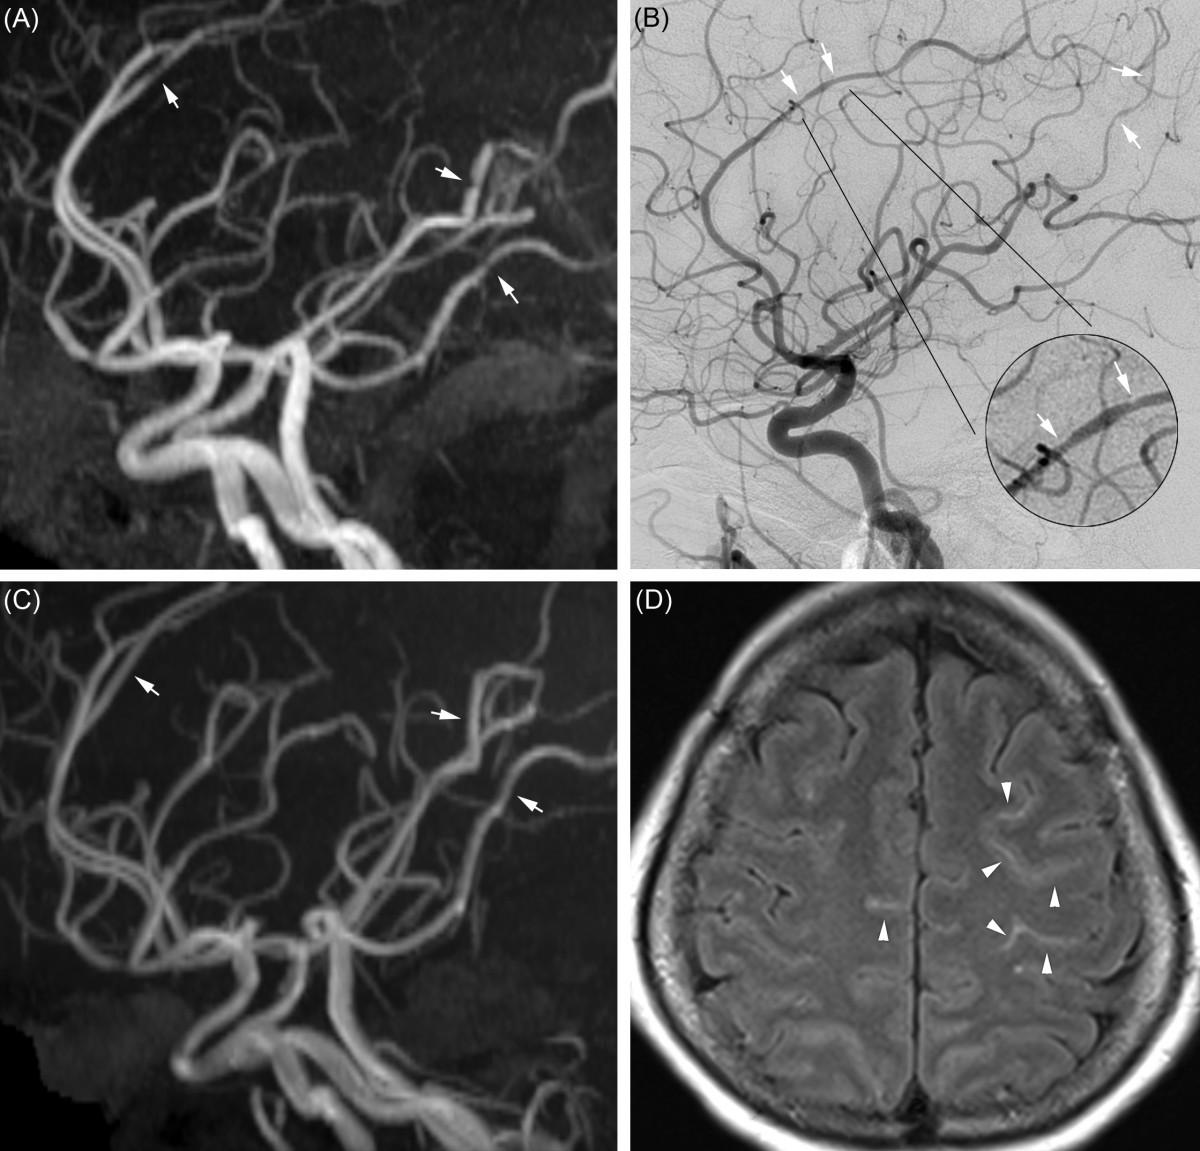 reversible cerebral vasoconstriction syndrome pdf